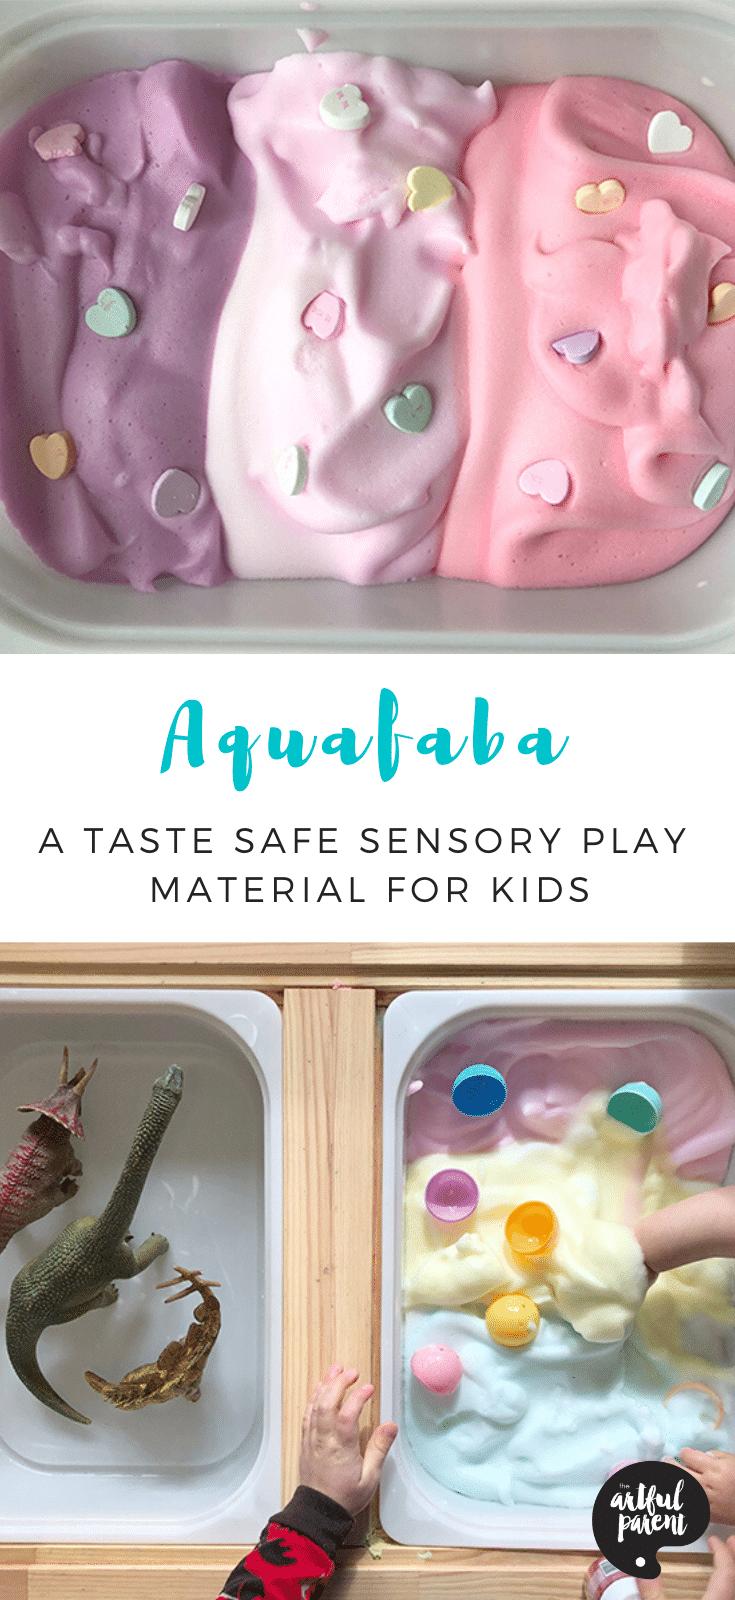 How to Make Aquafaba (A Taste-Safe Sensory Play Material for Kids)